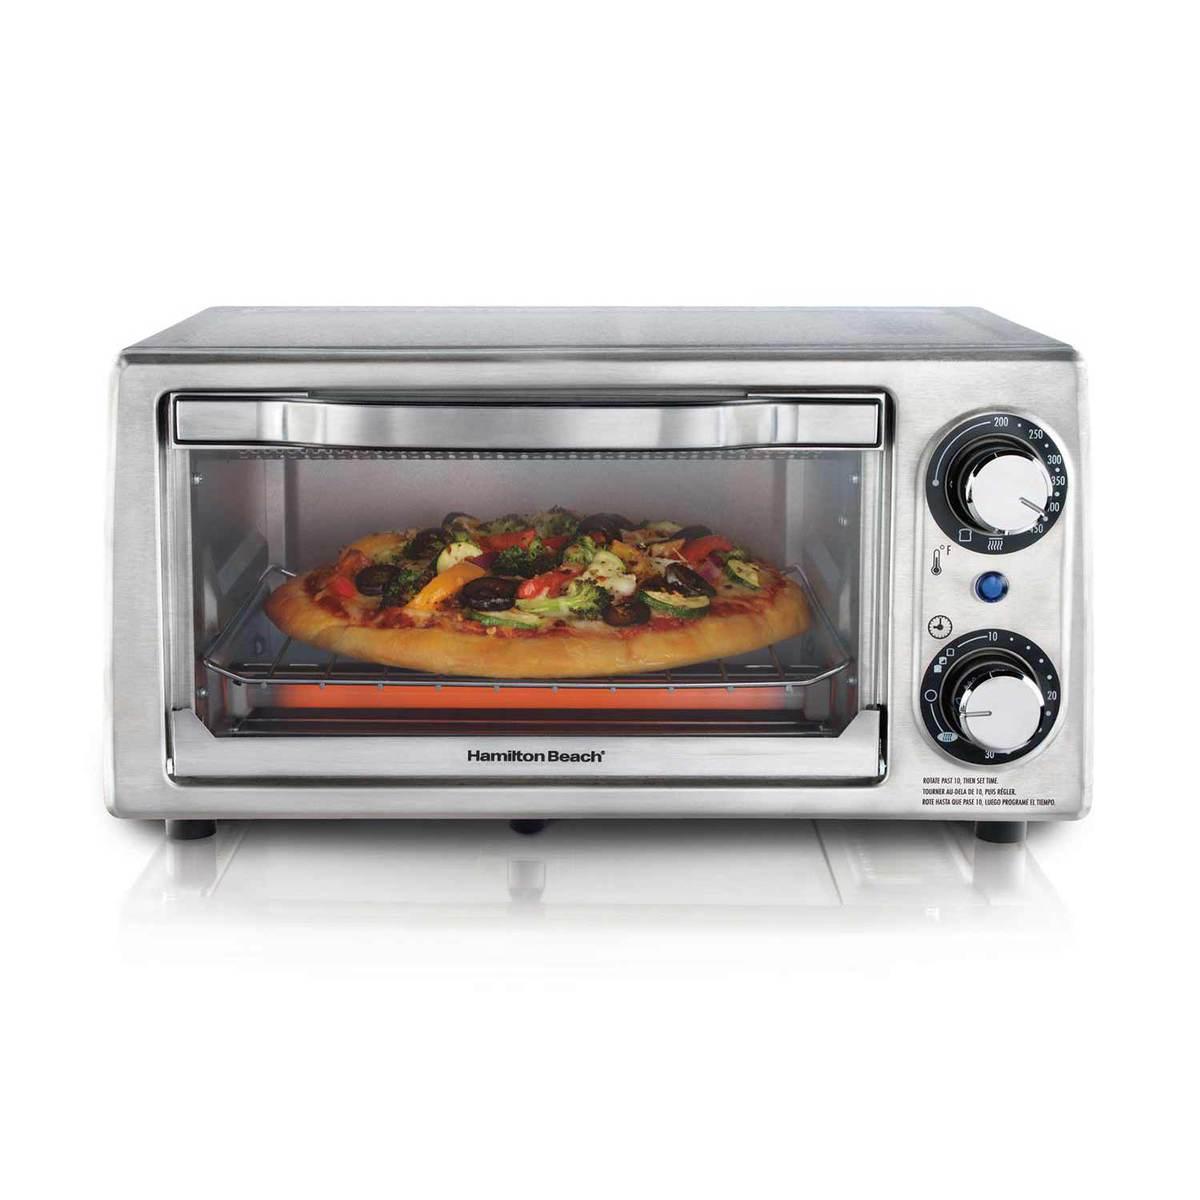 Stainless Steel 4 Slice Toaster Oven (31138)